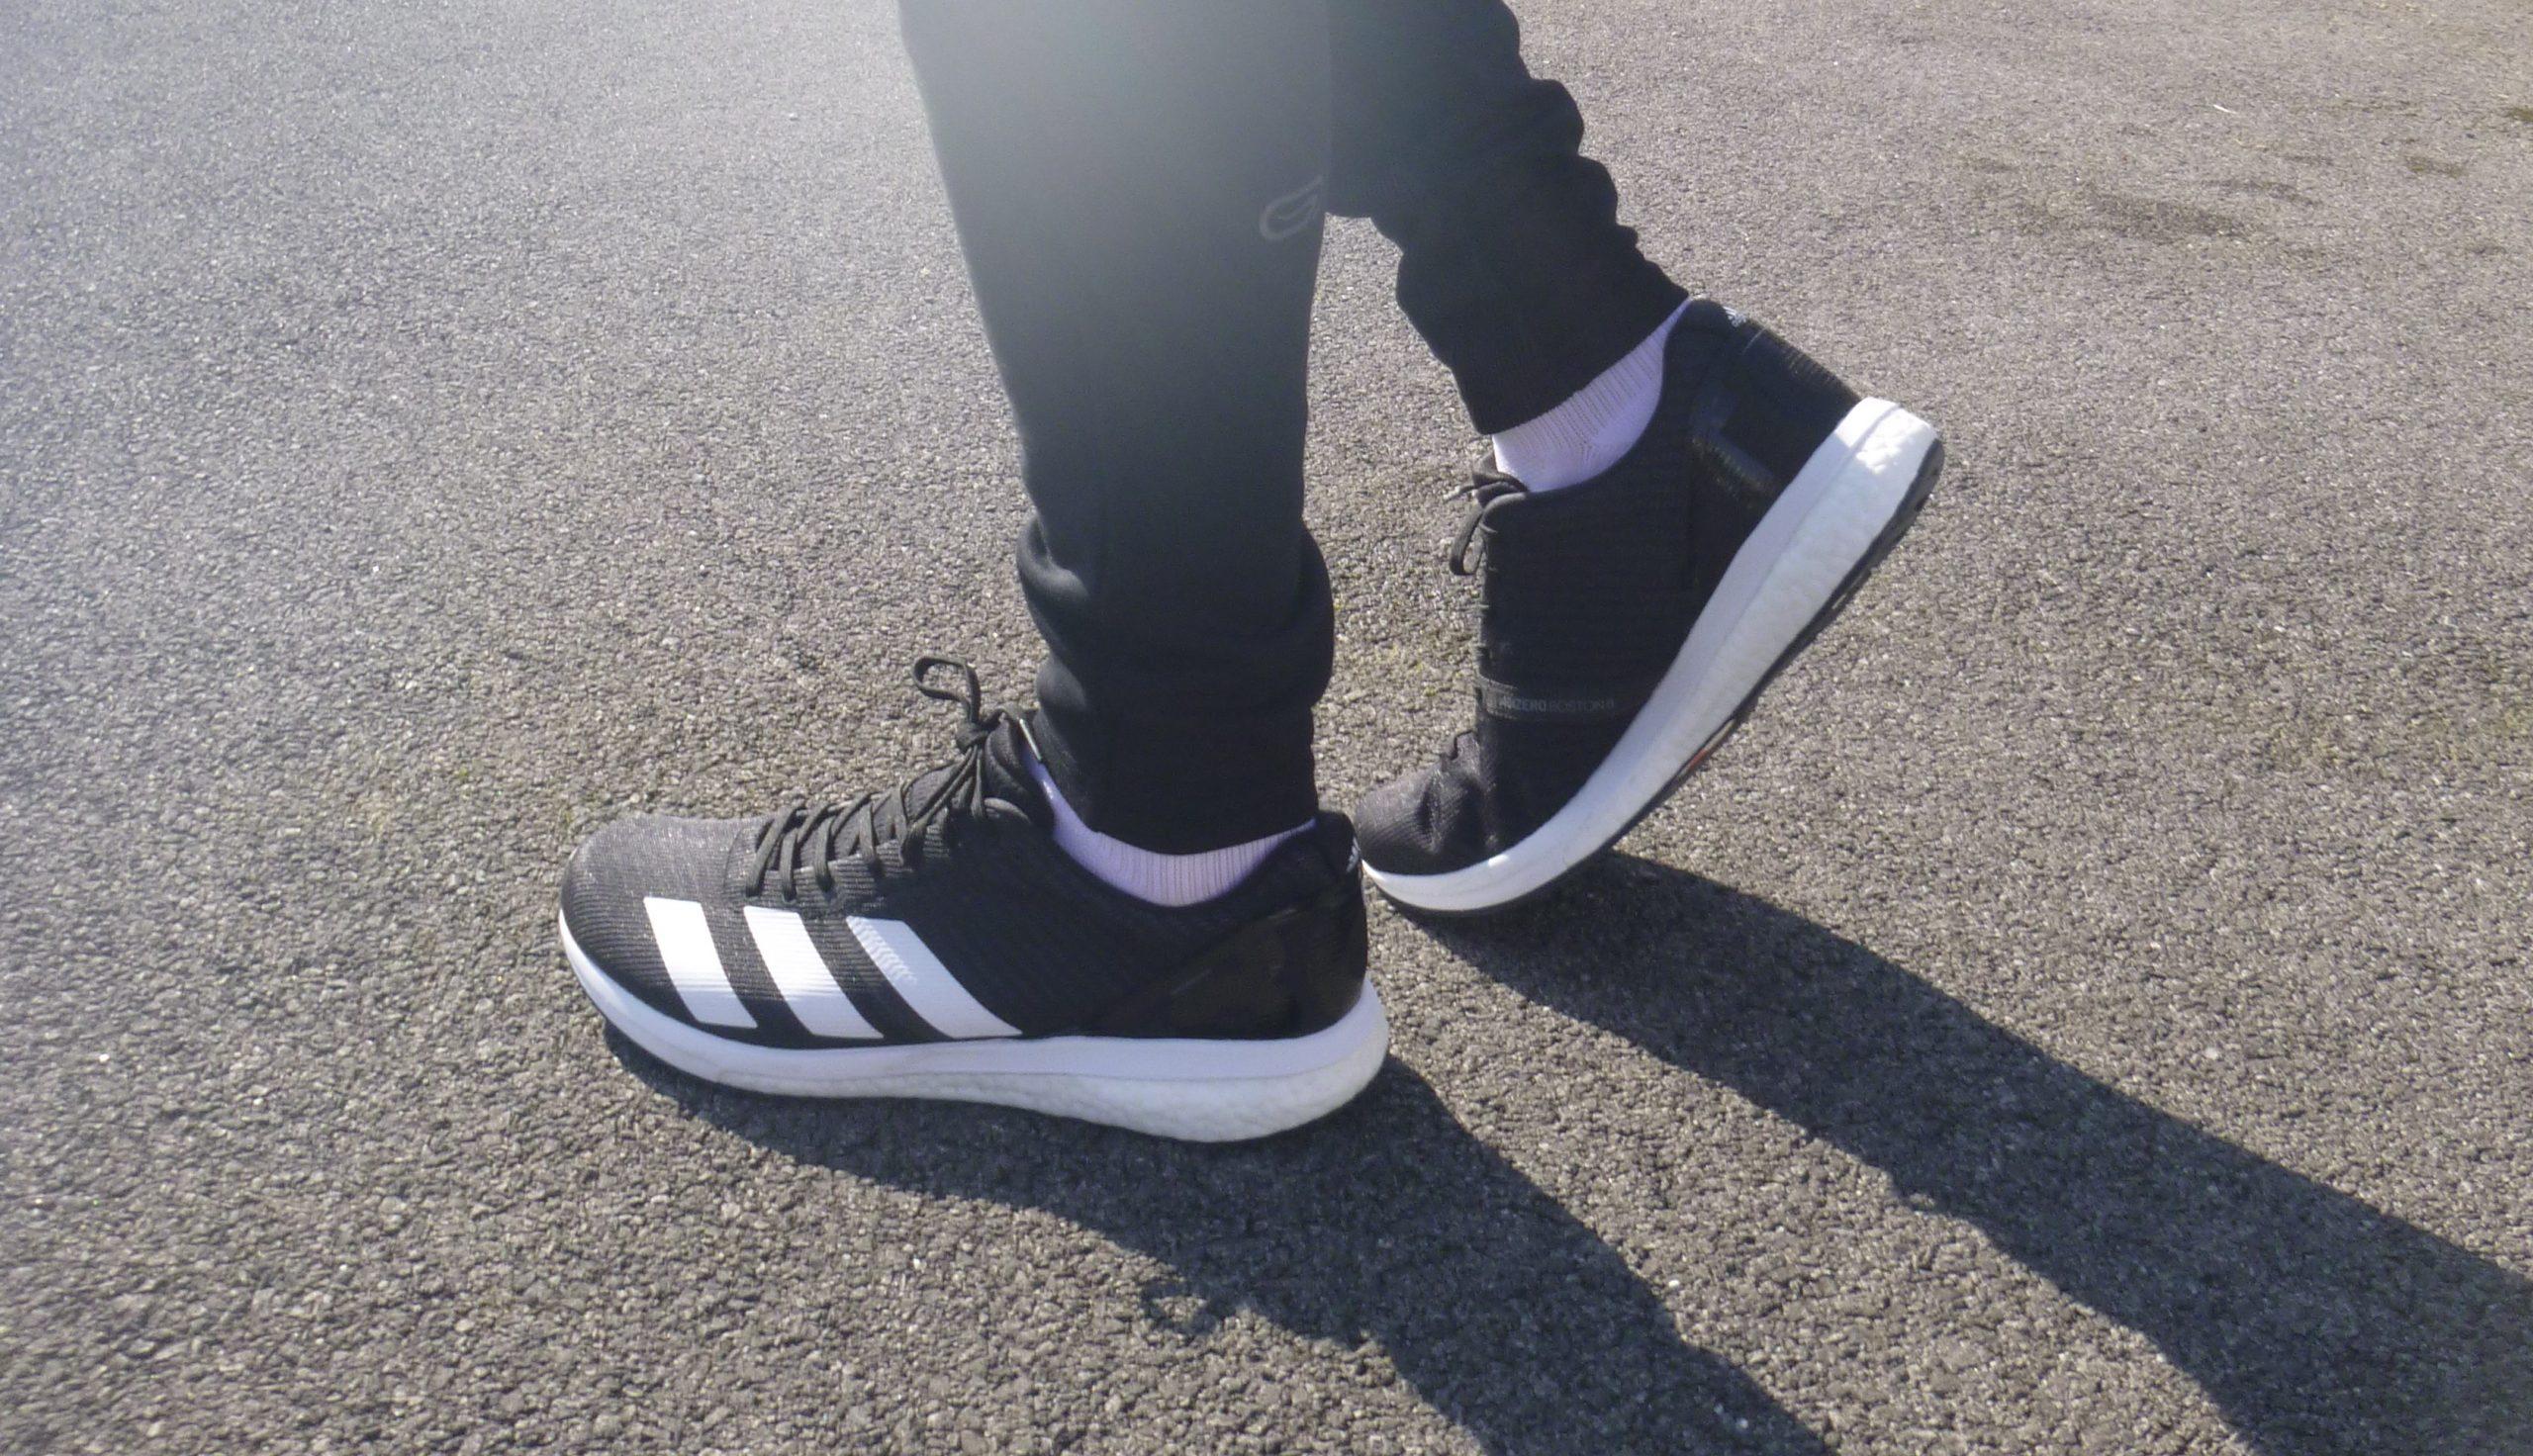 Test: Adidas Boston 8 Running up